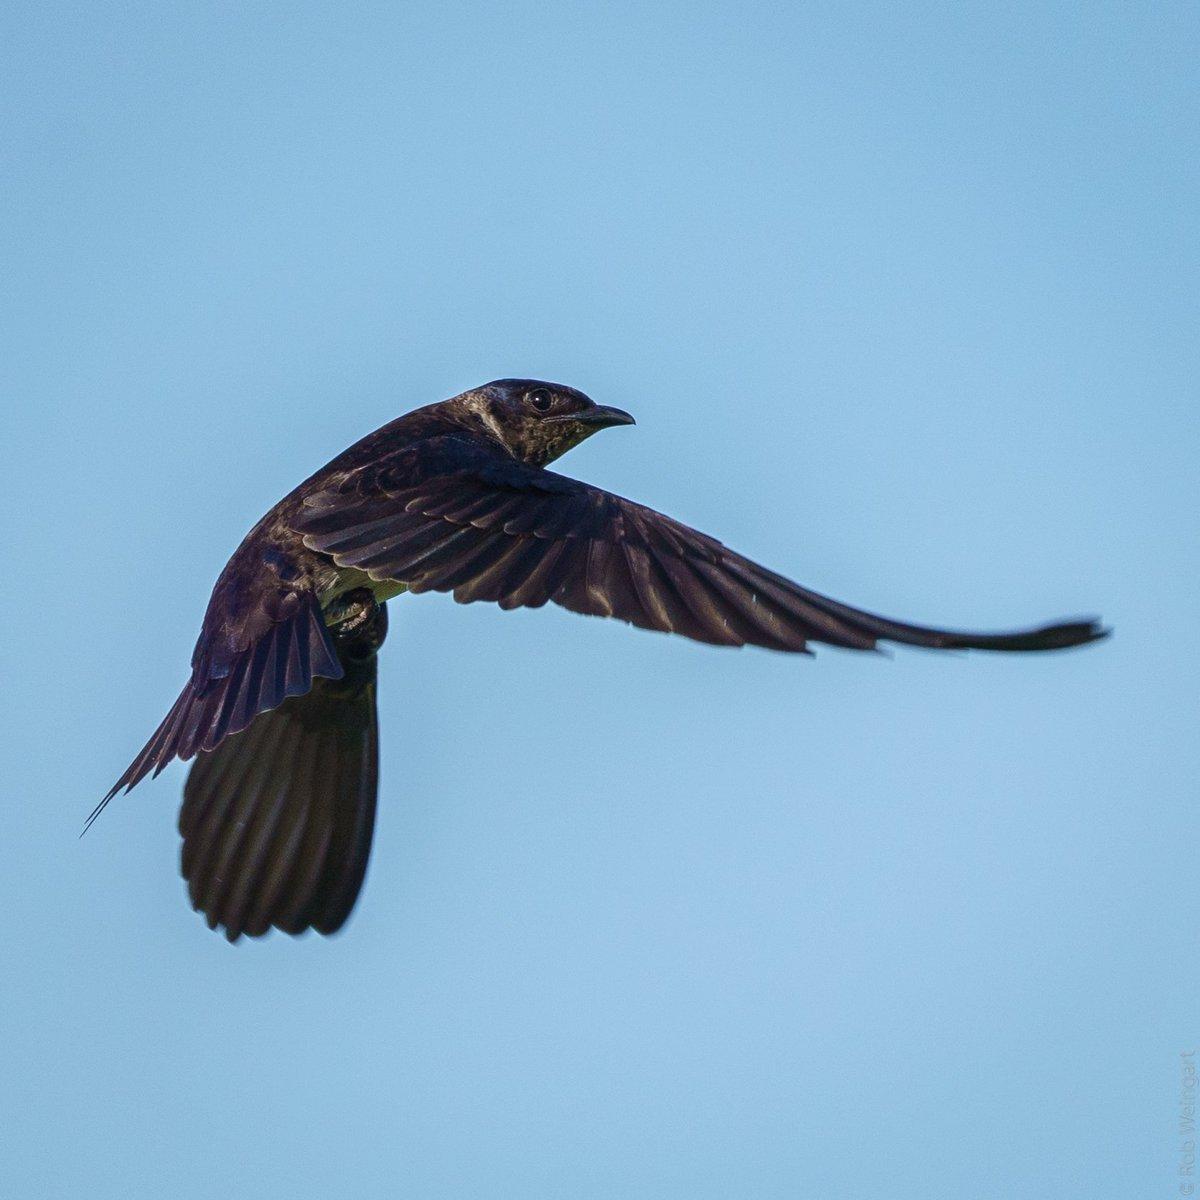 Purple Martin Fly-By- #InFlightFriday  #purplemartin #swallow #eyecontact  #wildlife #wildlifephotography #birding https://t.co/zMMB818nK4